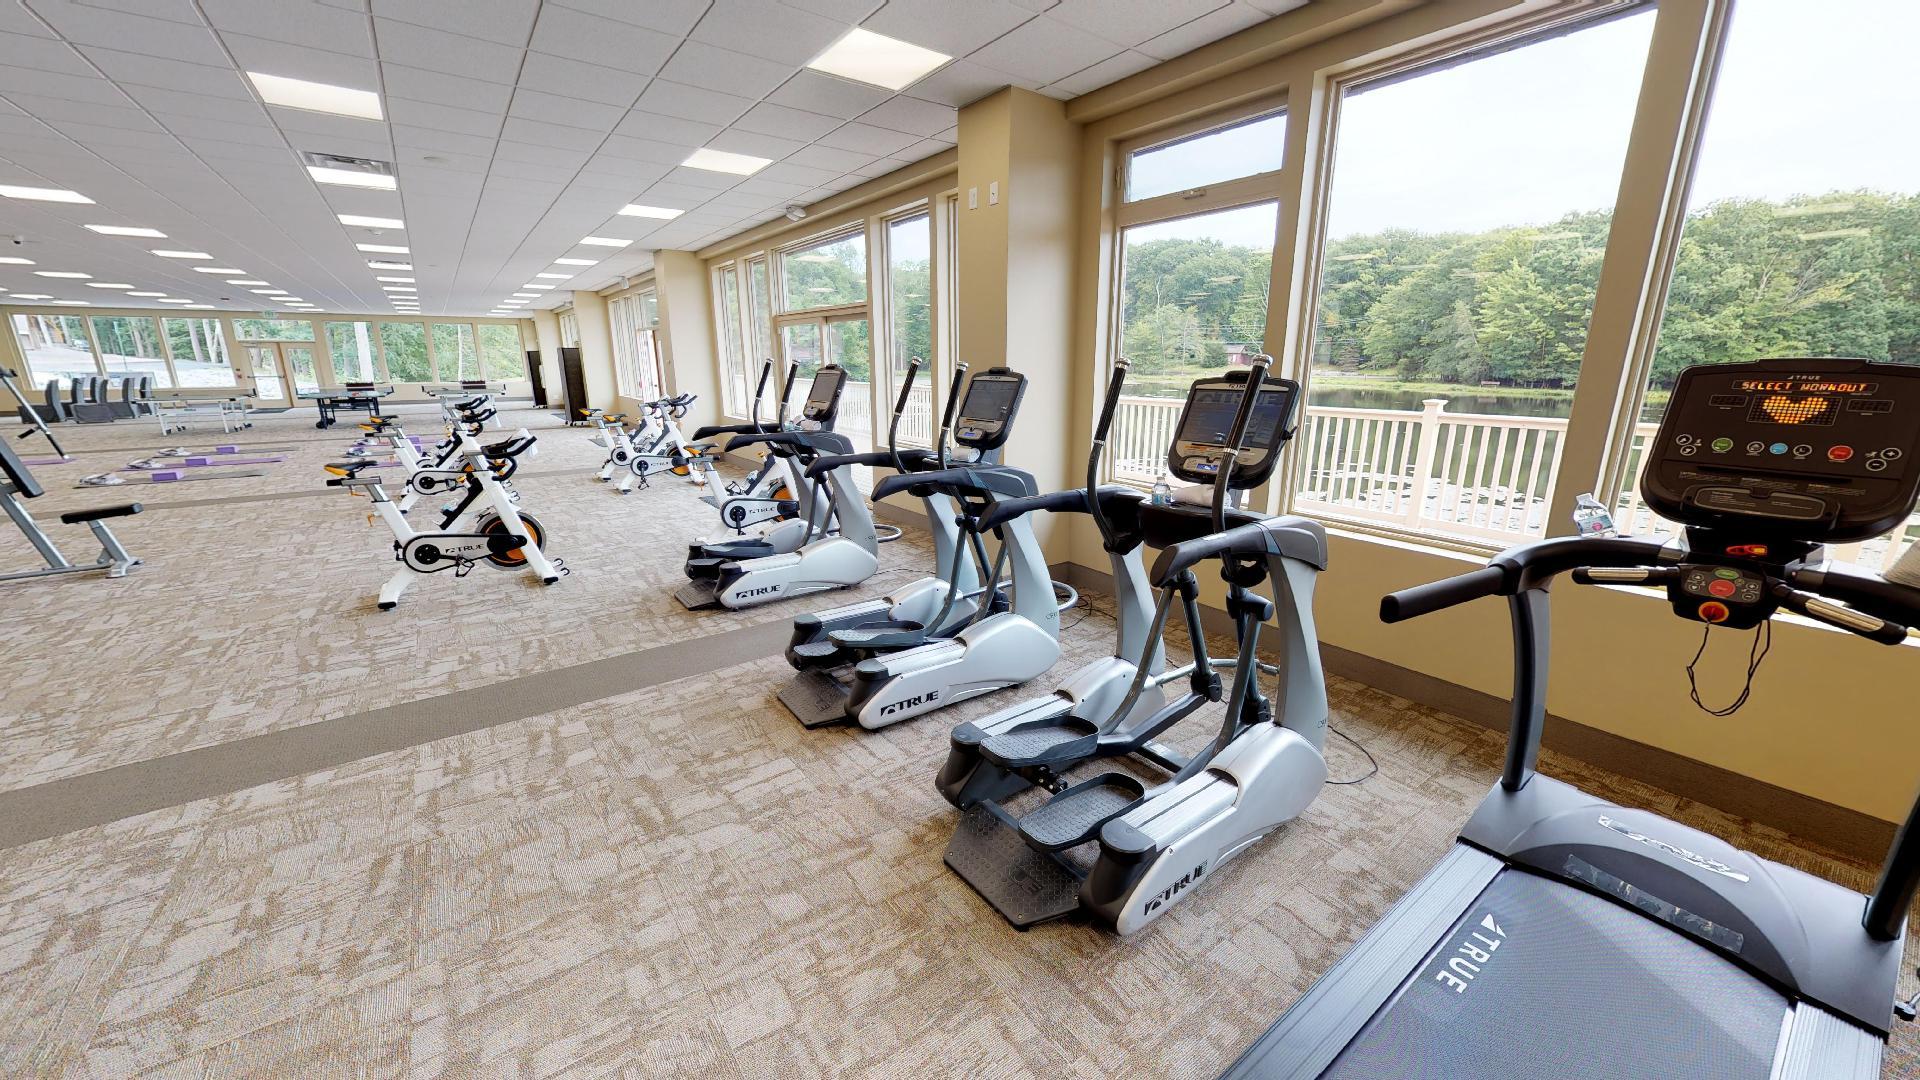 Fitness Center at Pocono Pennsylvania Drug & Alcohol Rehab Center